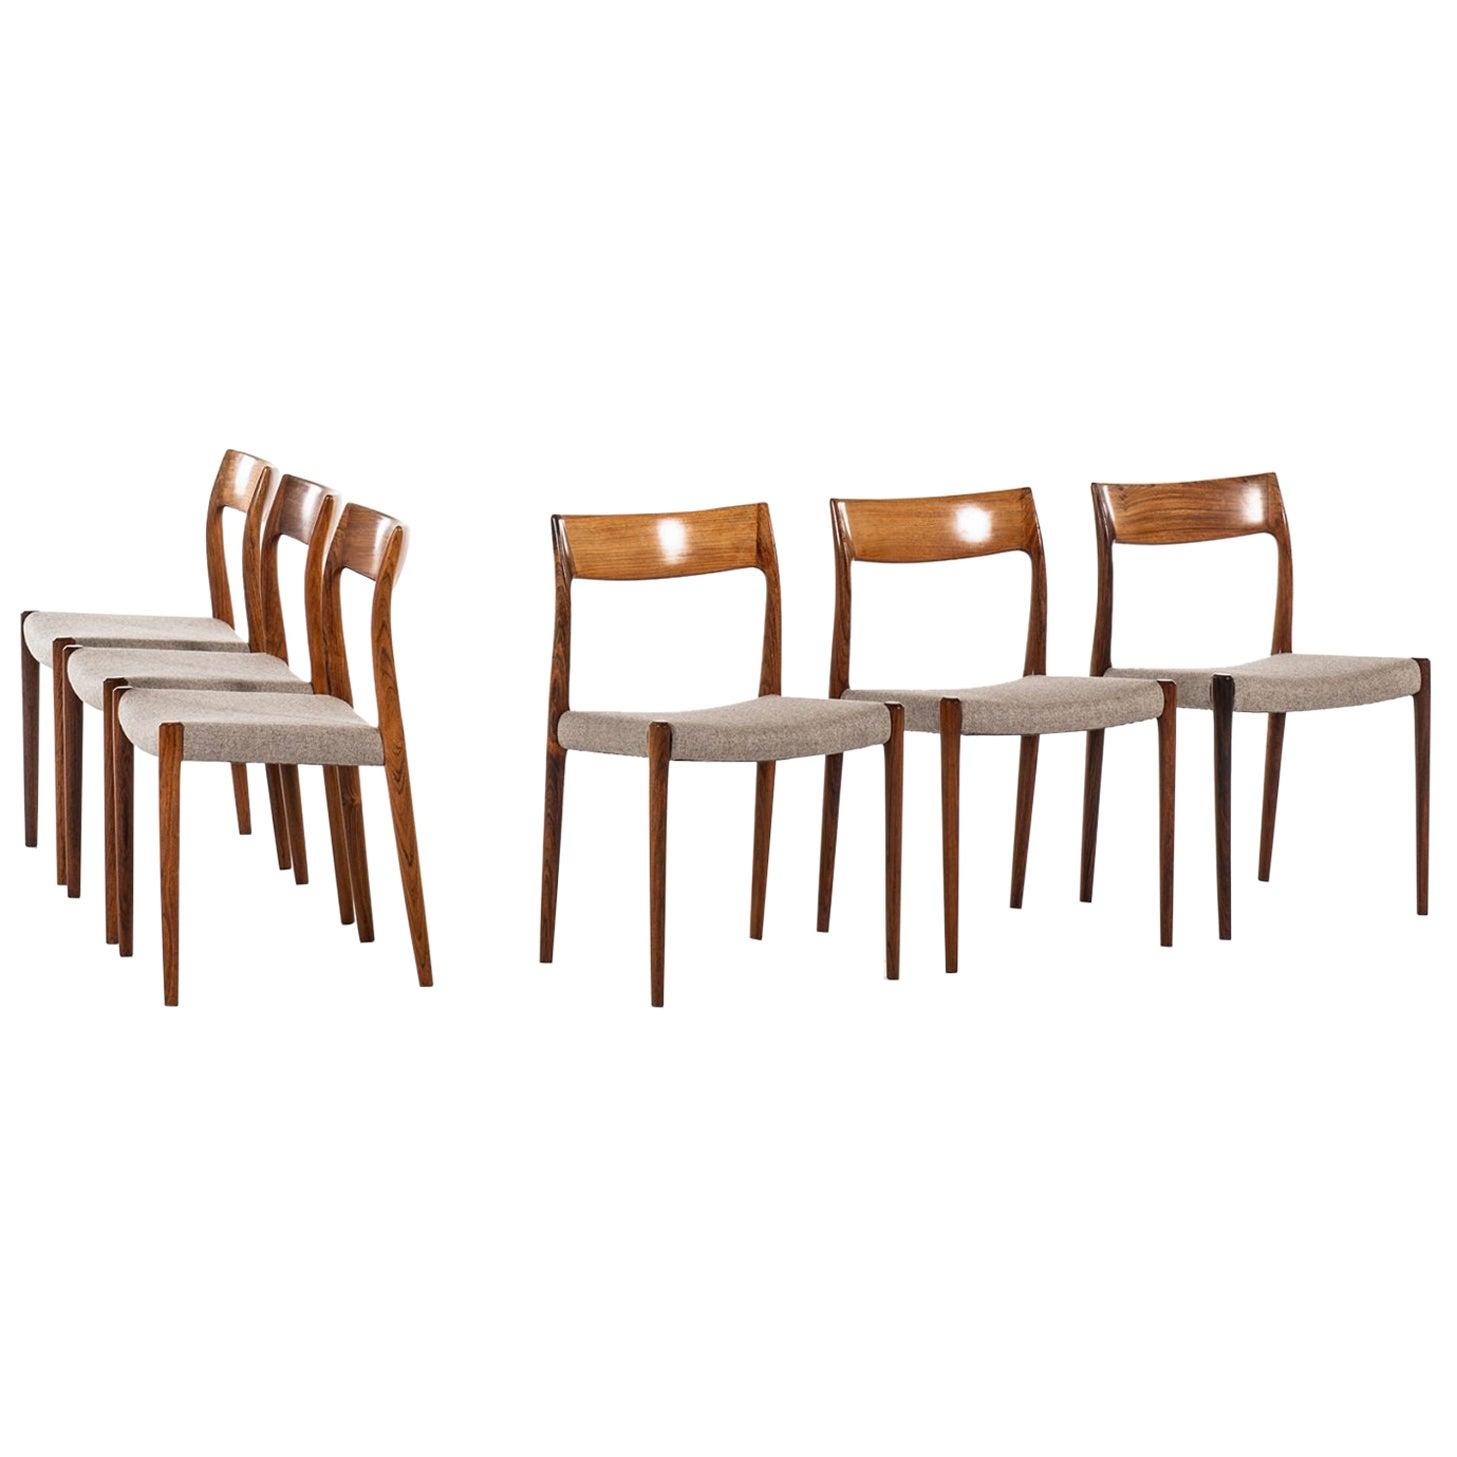 Niels O. Møller Dining Chairs Model 77 by J.L. Møllers Møbelfabrik in Denmark